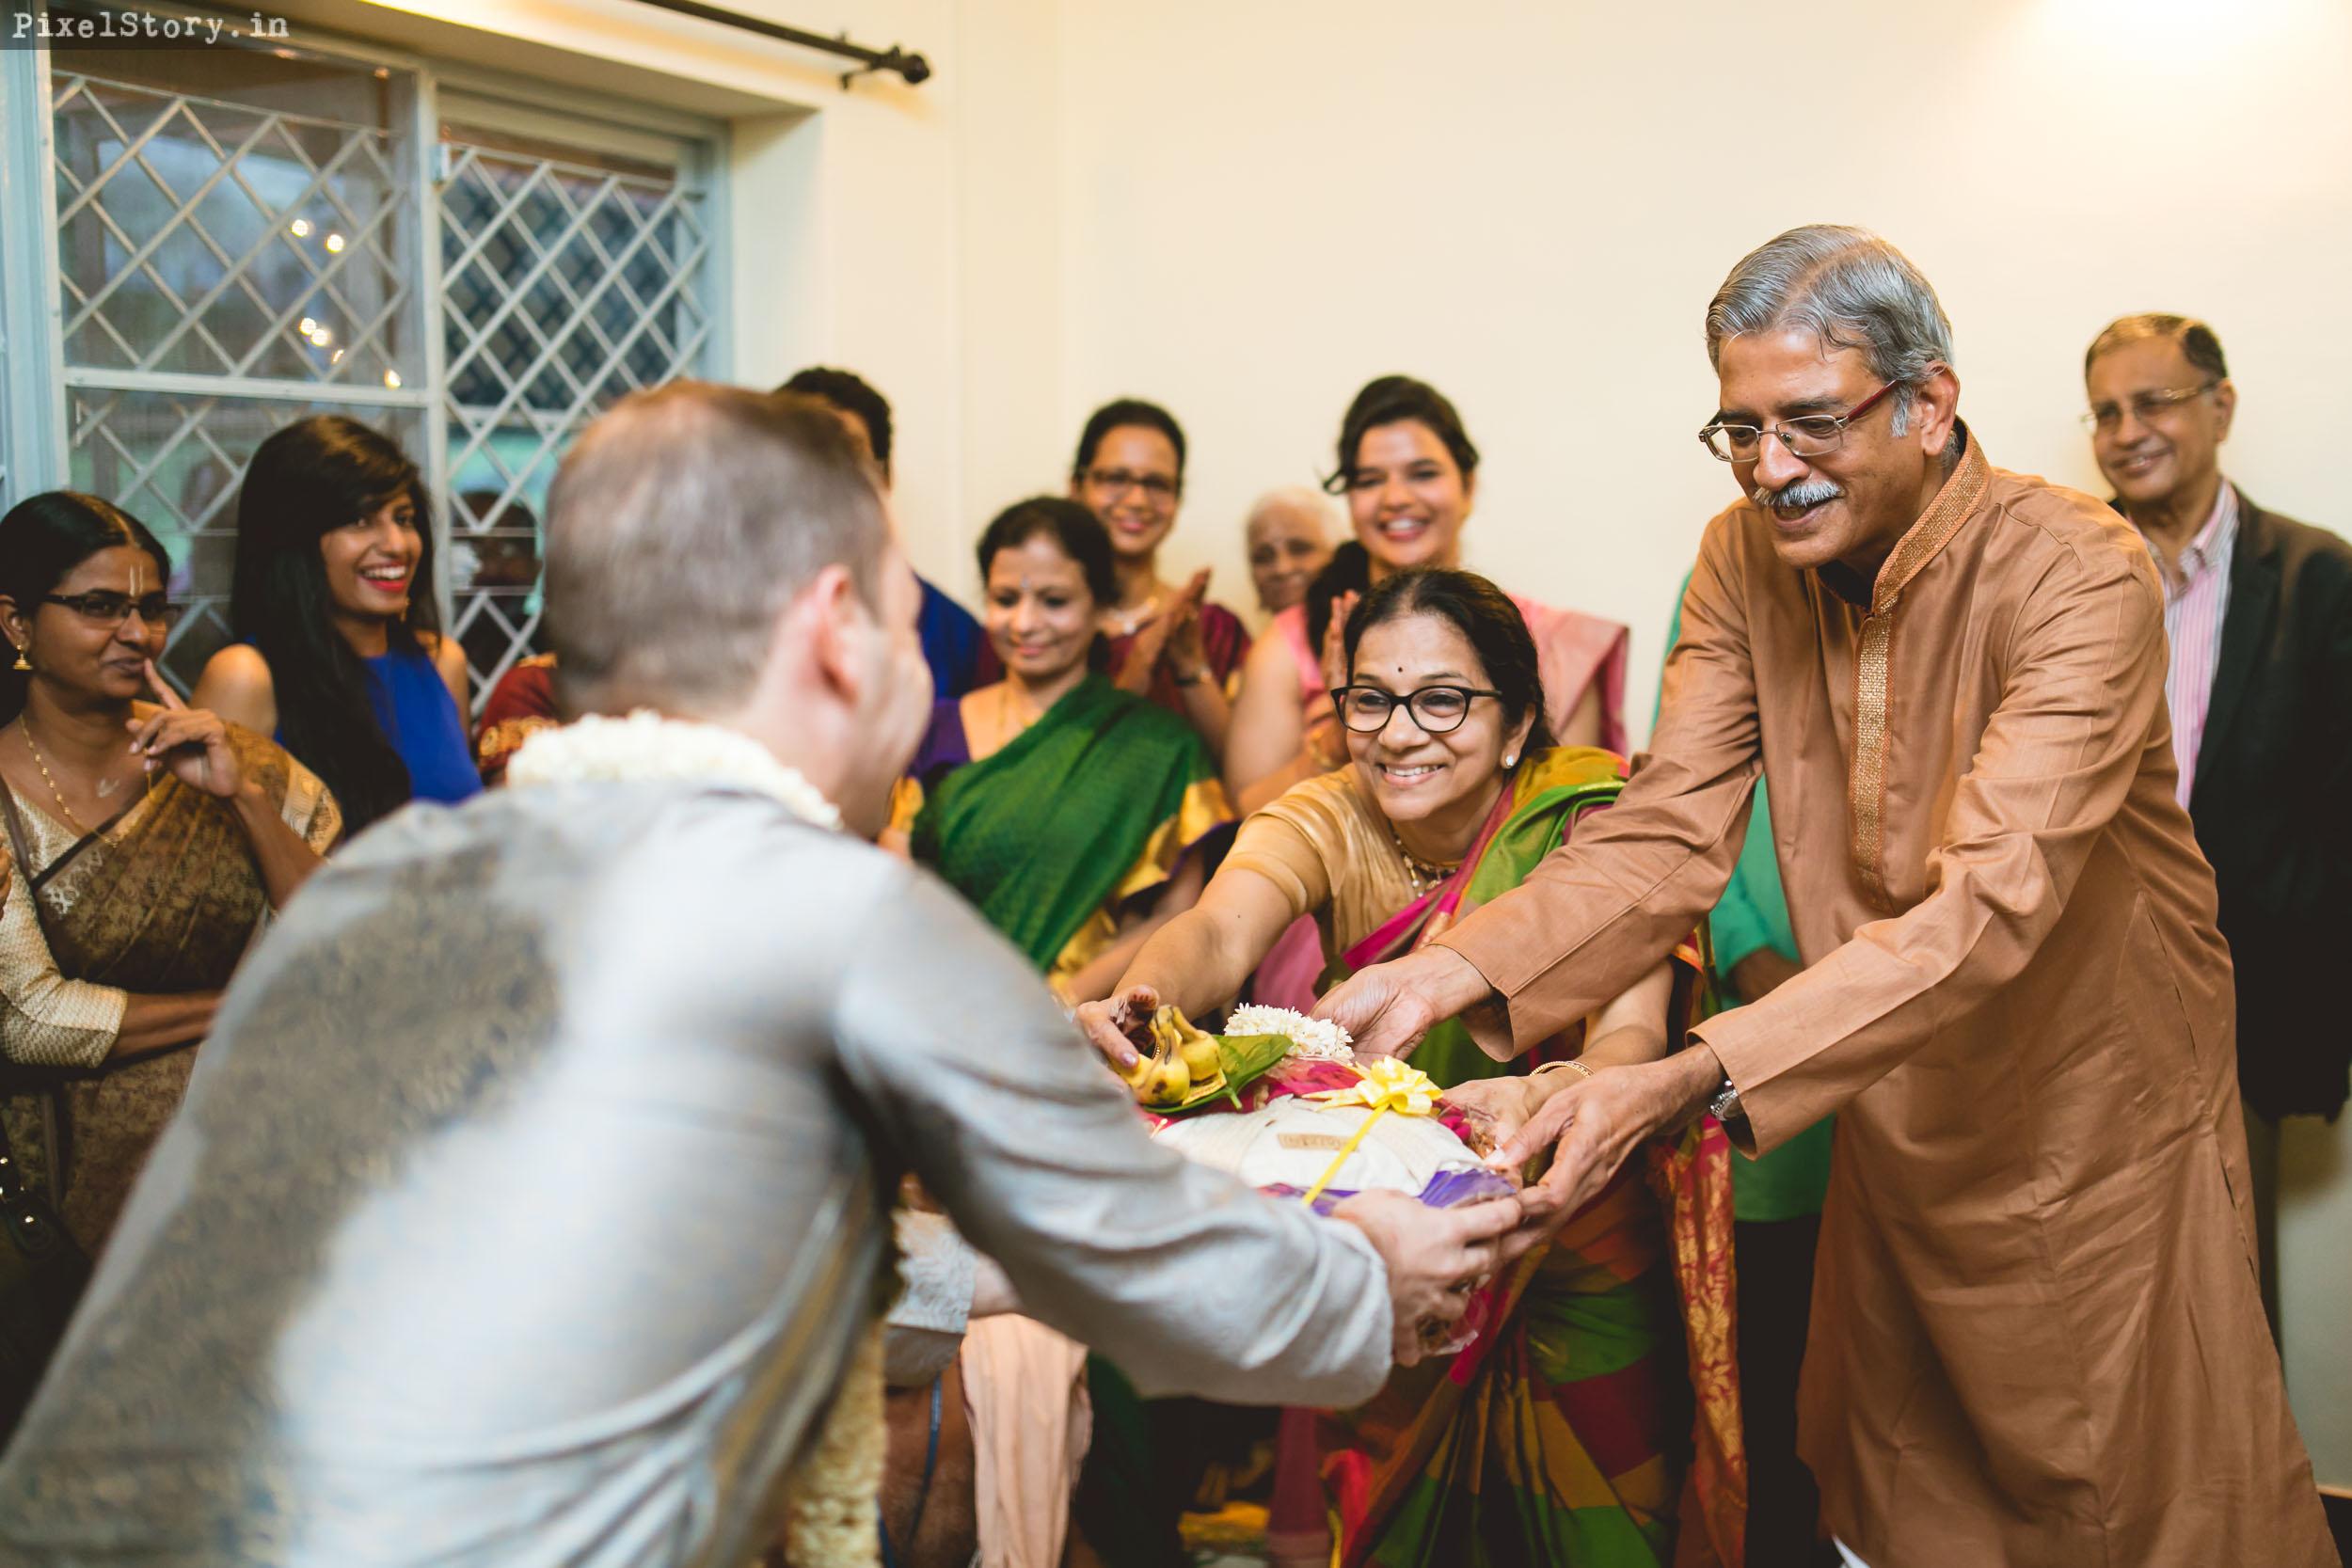 PixelStory-Jungle-Wedding-Photographer-Masinagudi-Indo-French010.jpg